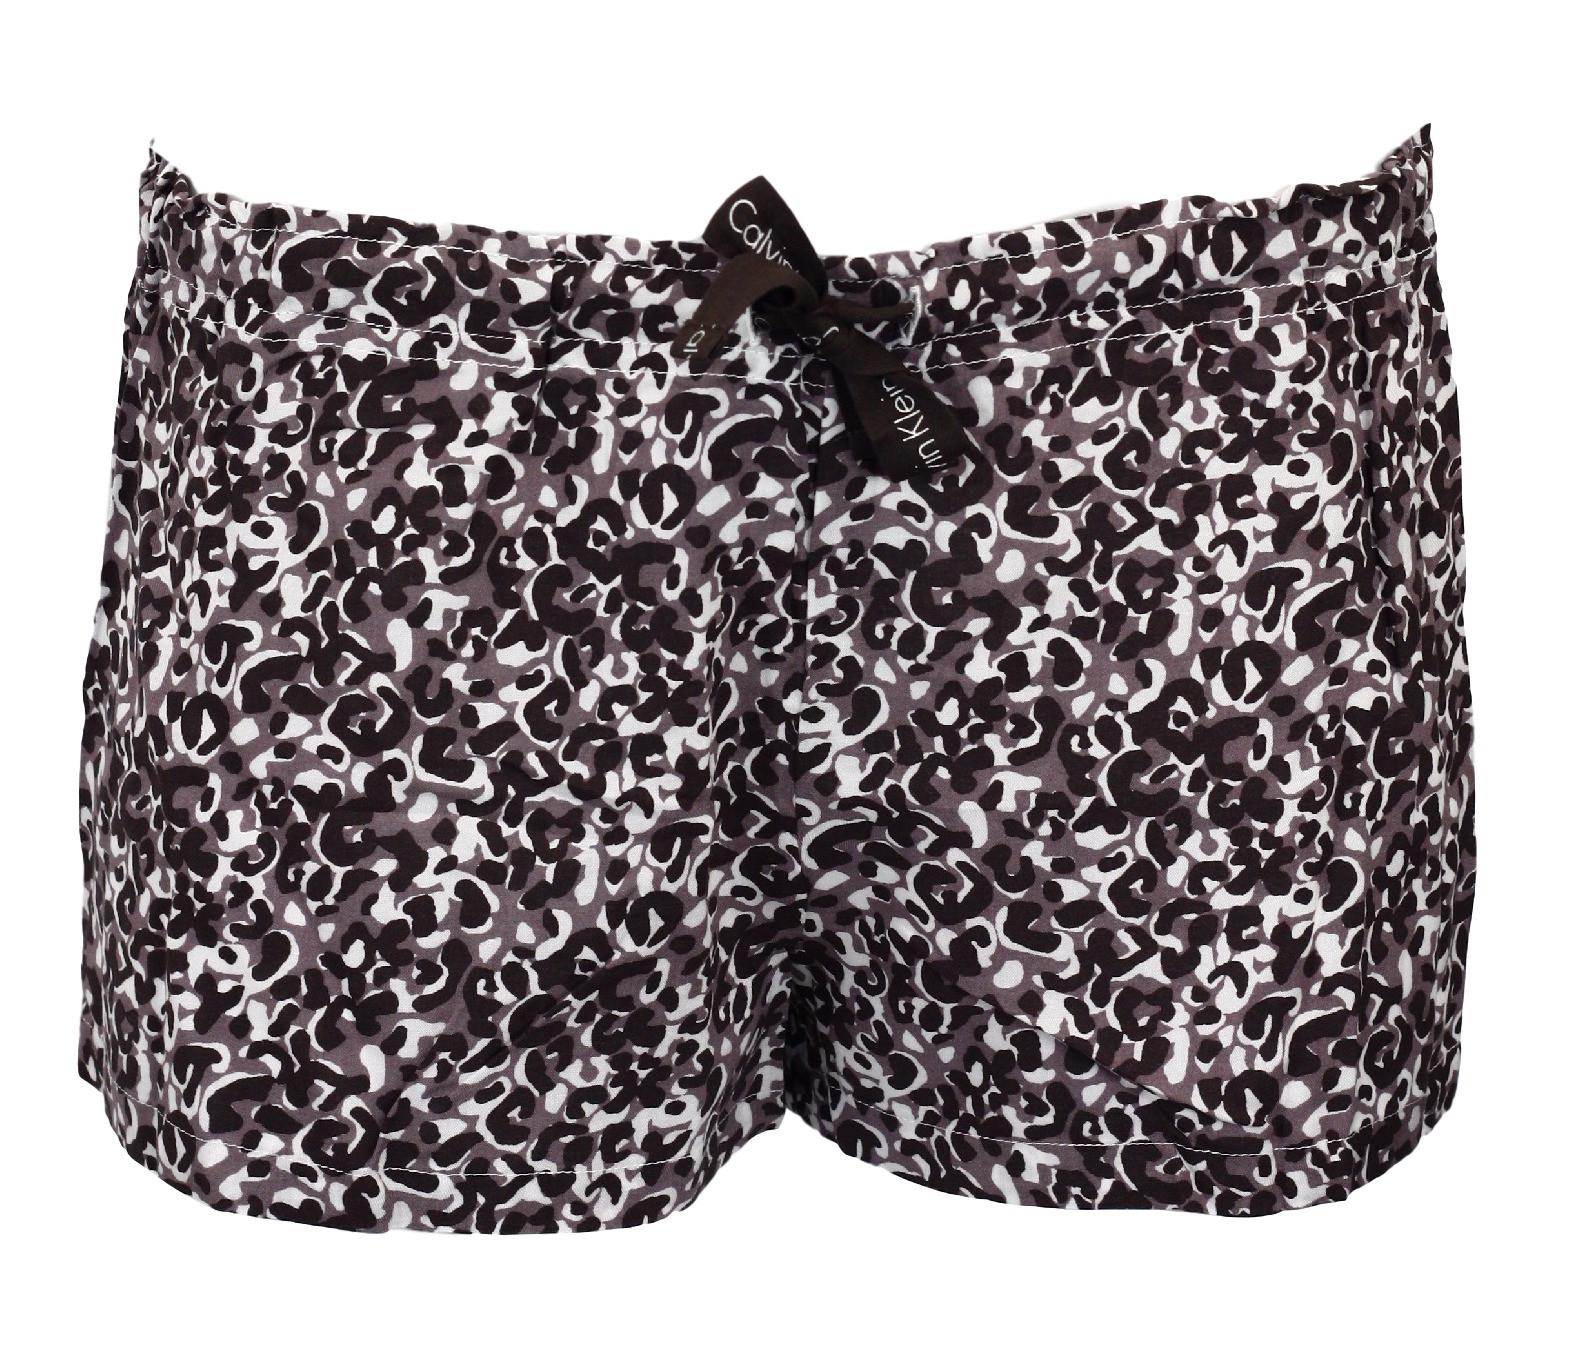 Dámské shorty QS1679E - Calvin Klein Barva: hnědá mix, Velikost: S